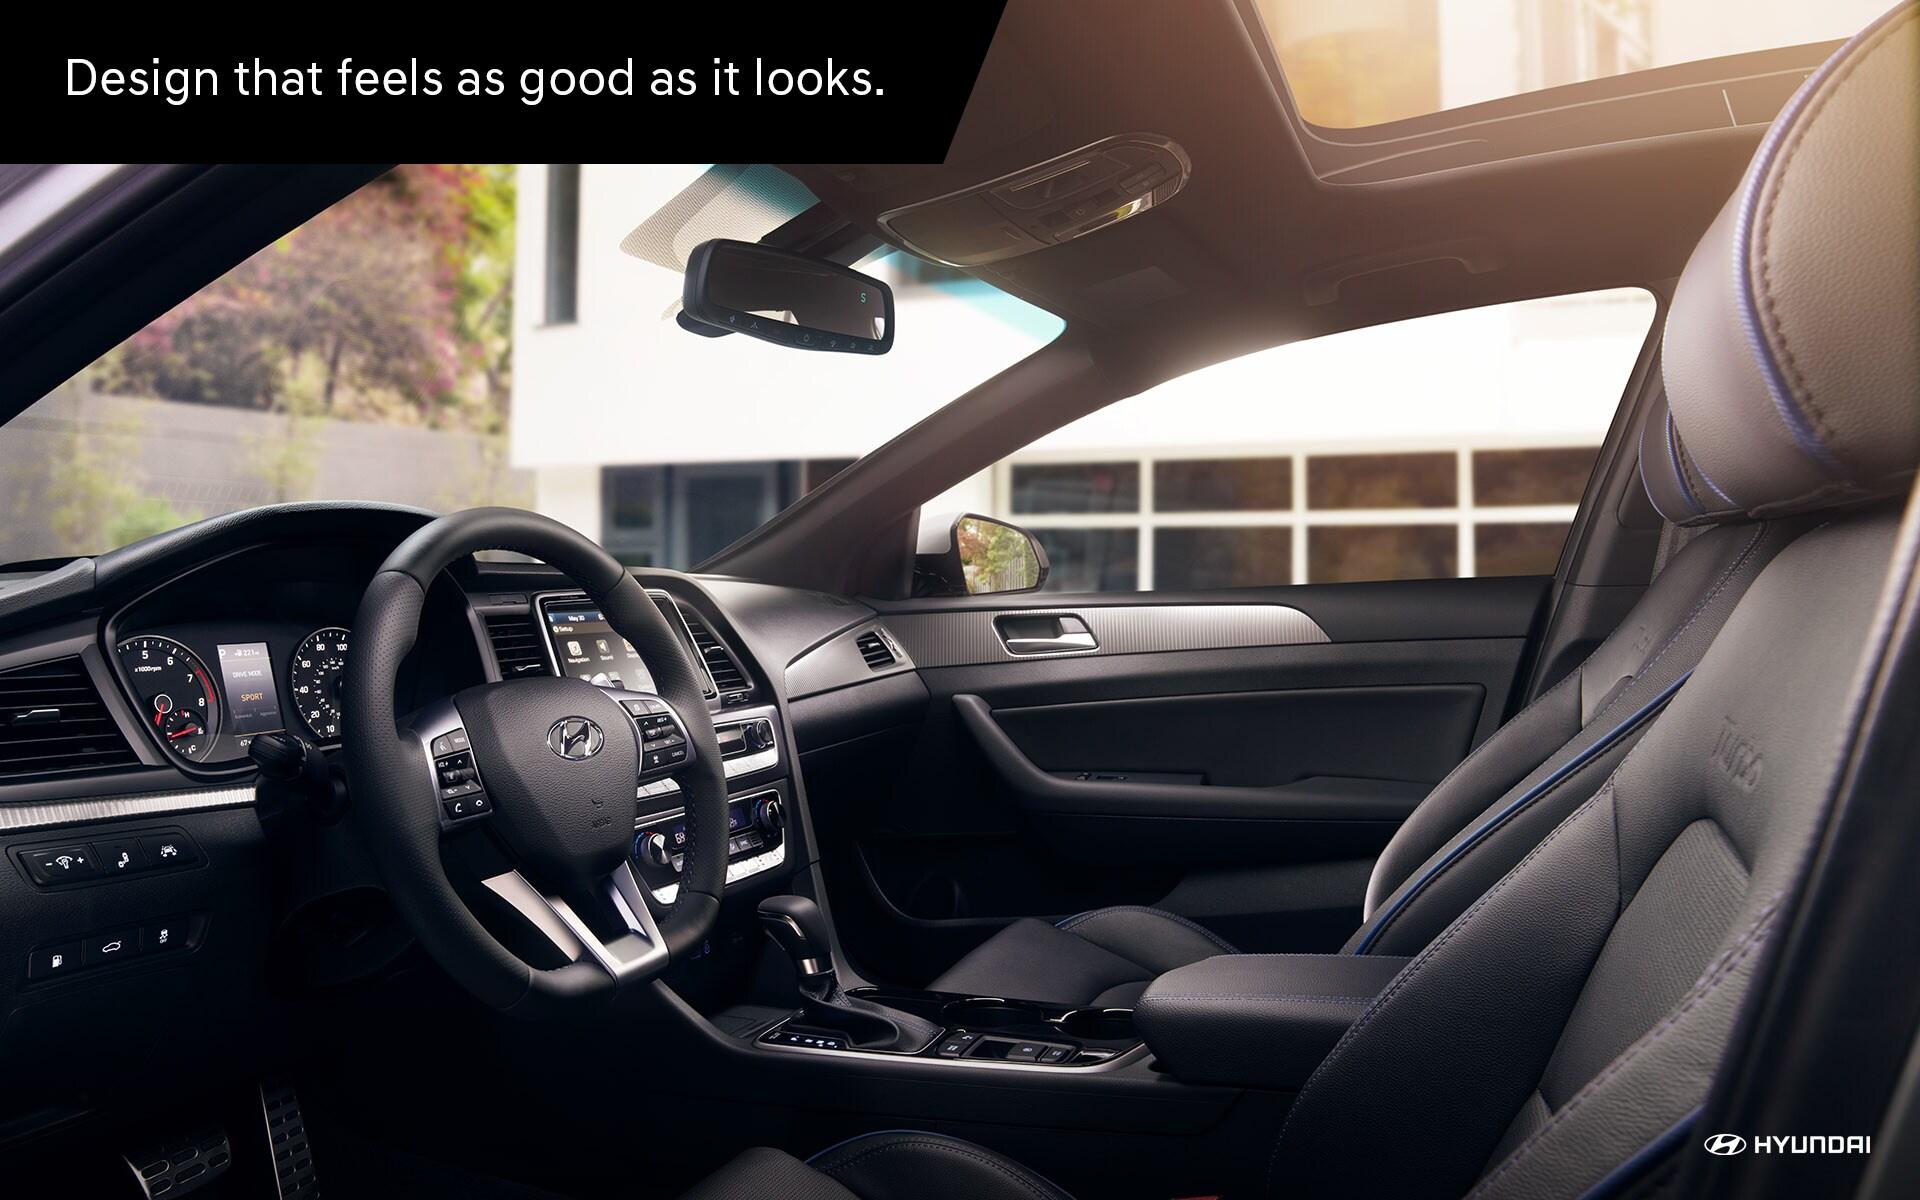 Family Hyundai Tinley Park >> Get A Glimpse of the 2018 Hyundai Sonata at Your #1 Volume